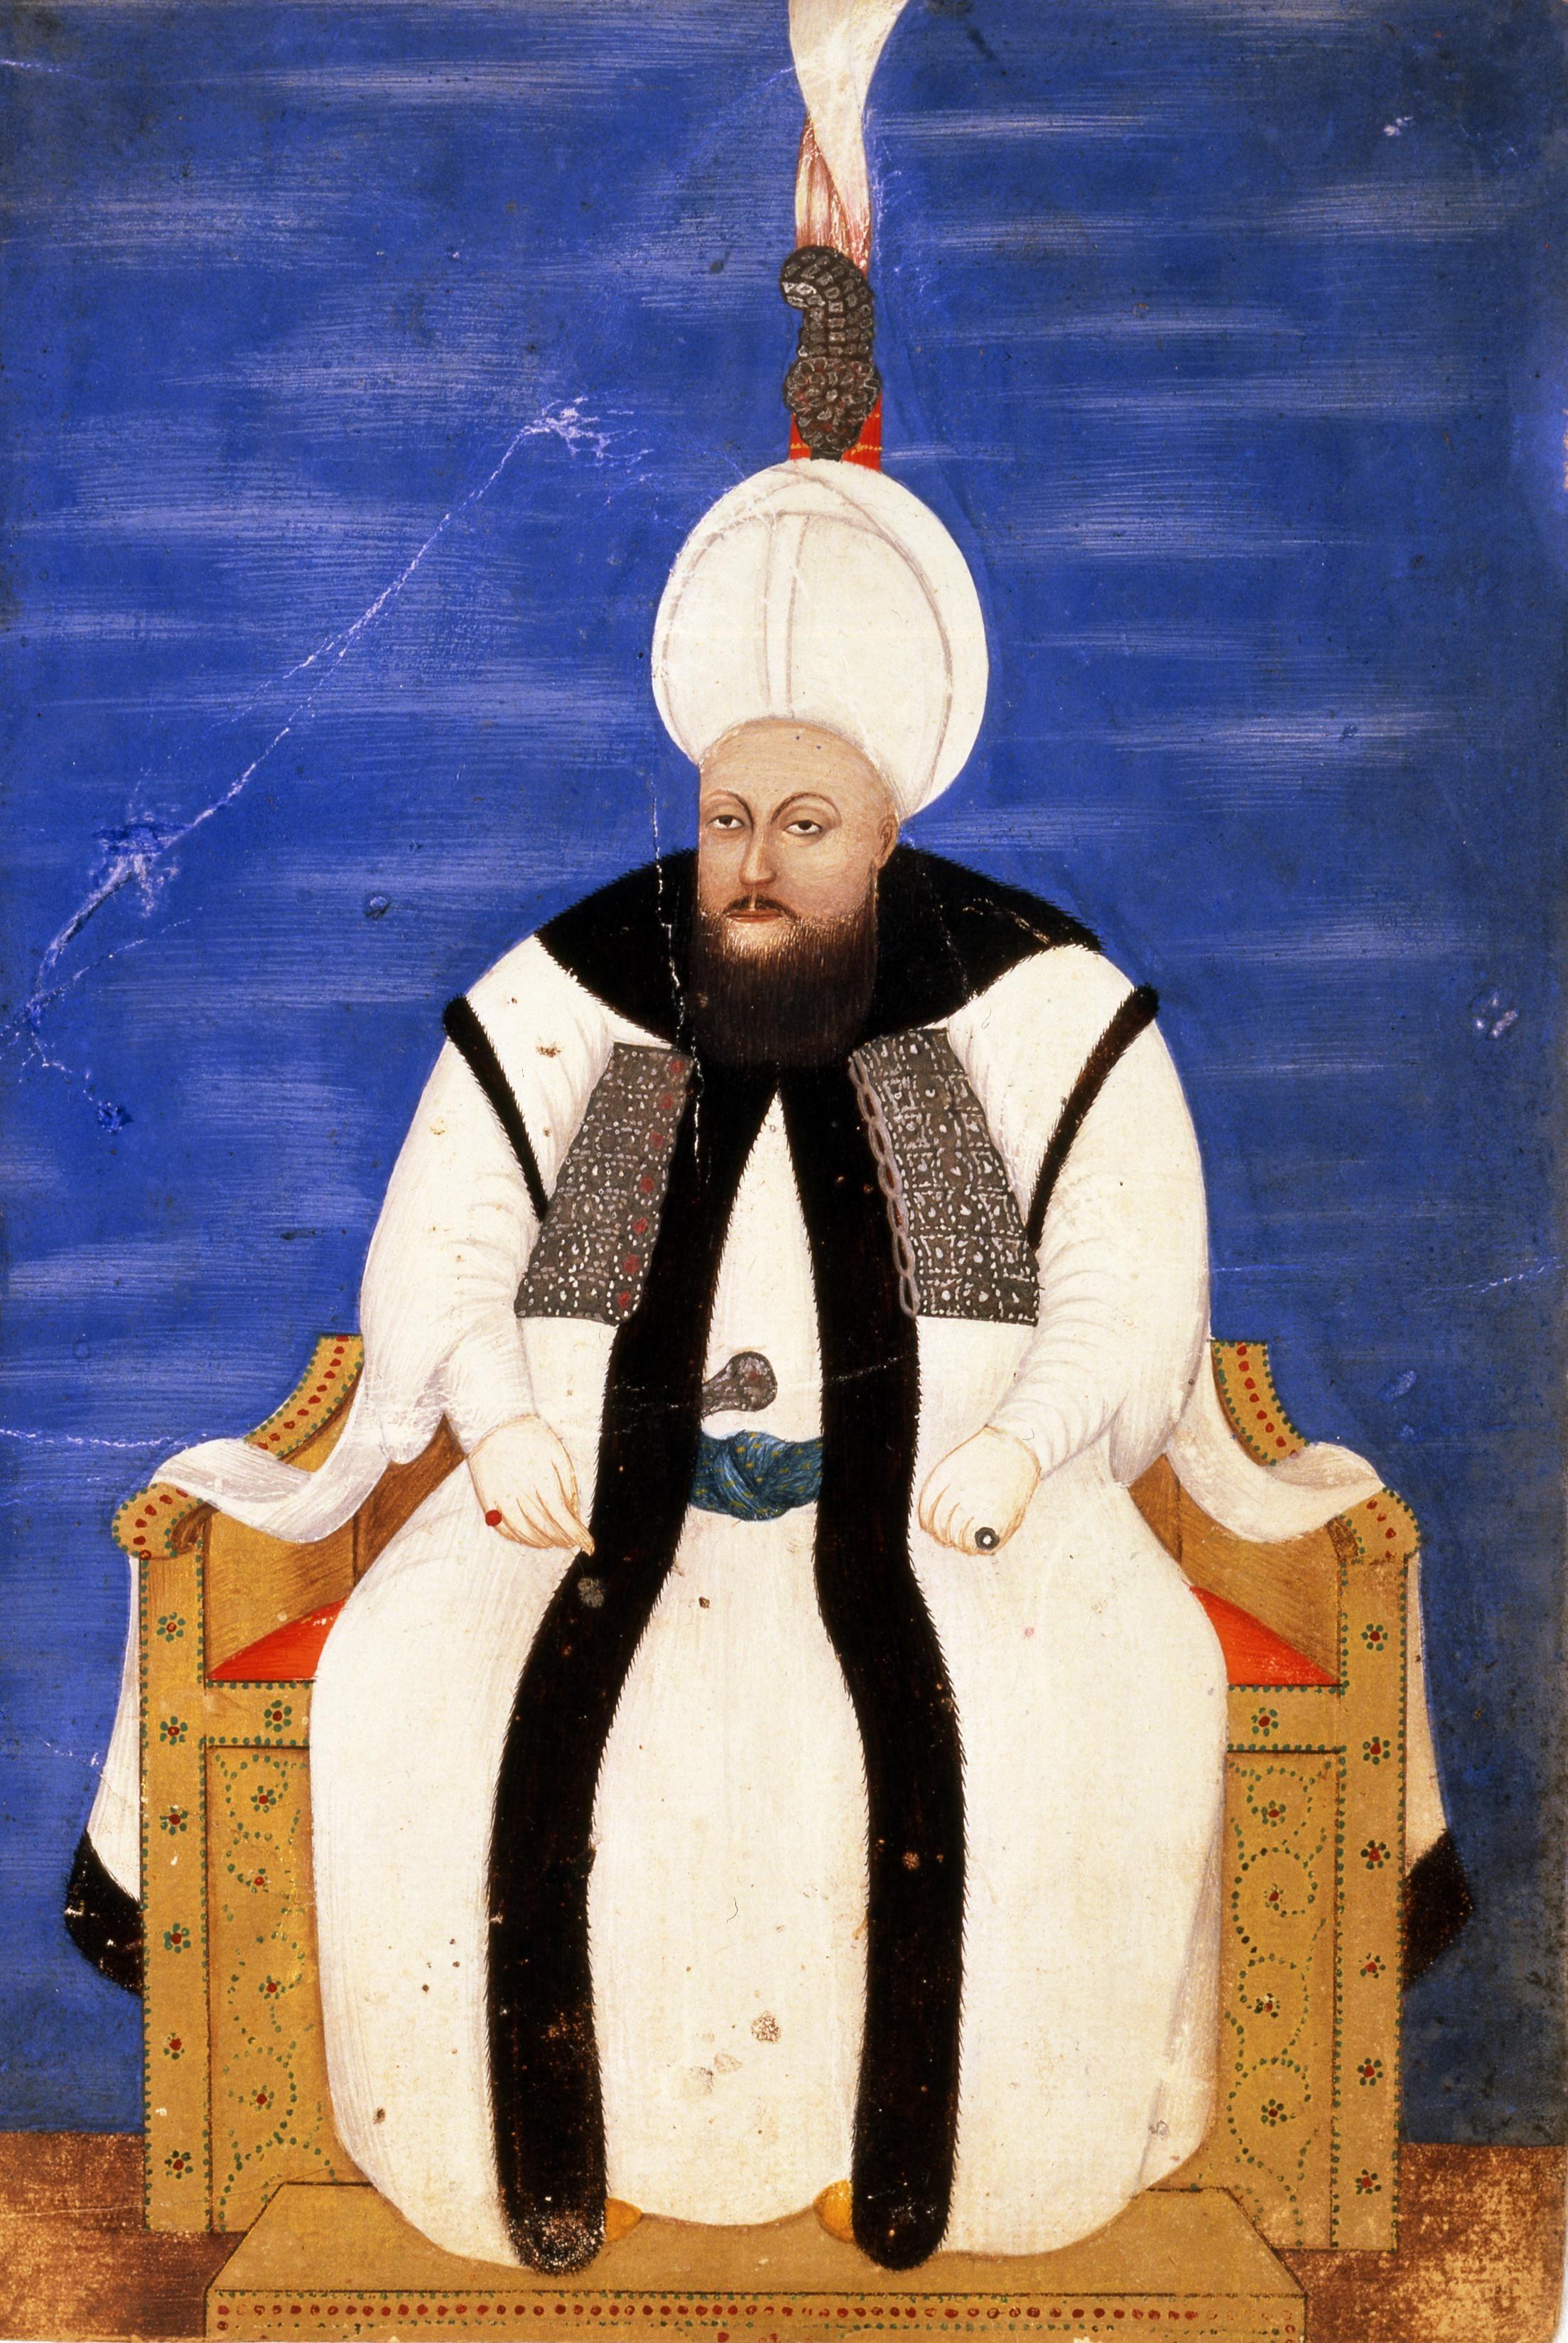 Sultan Iii Mustafa Bir Def I Hacete Bile Degmeyen Saltanat